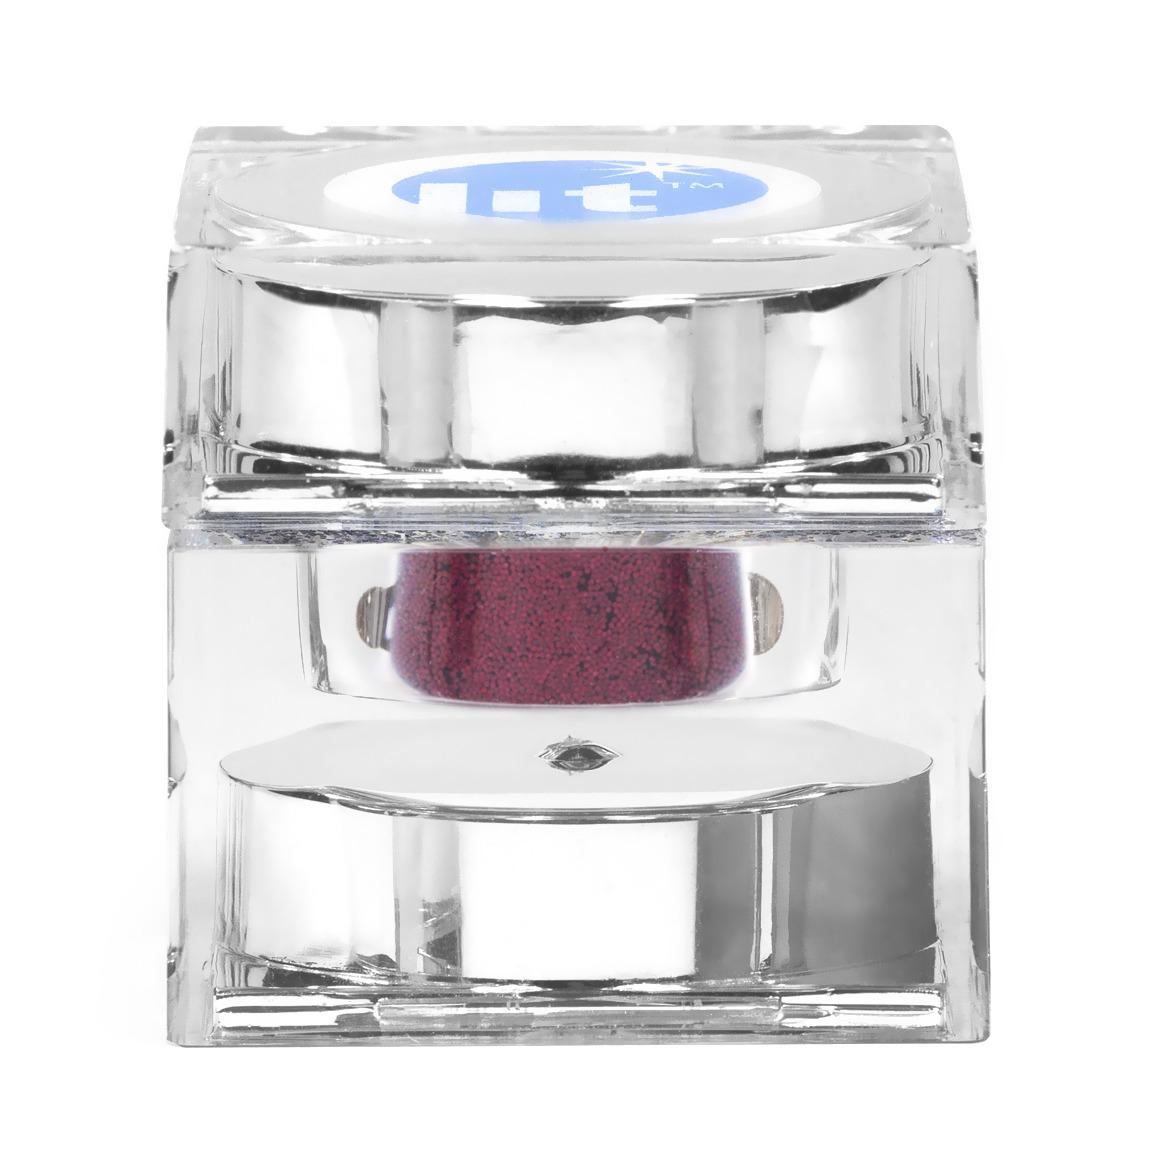 Lit Cosmetics Holographic Glitter Pigment Heartbreaker S2